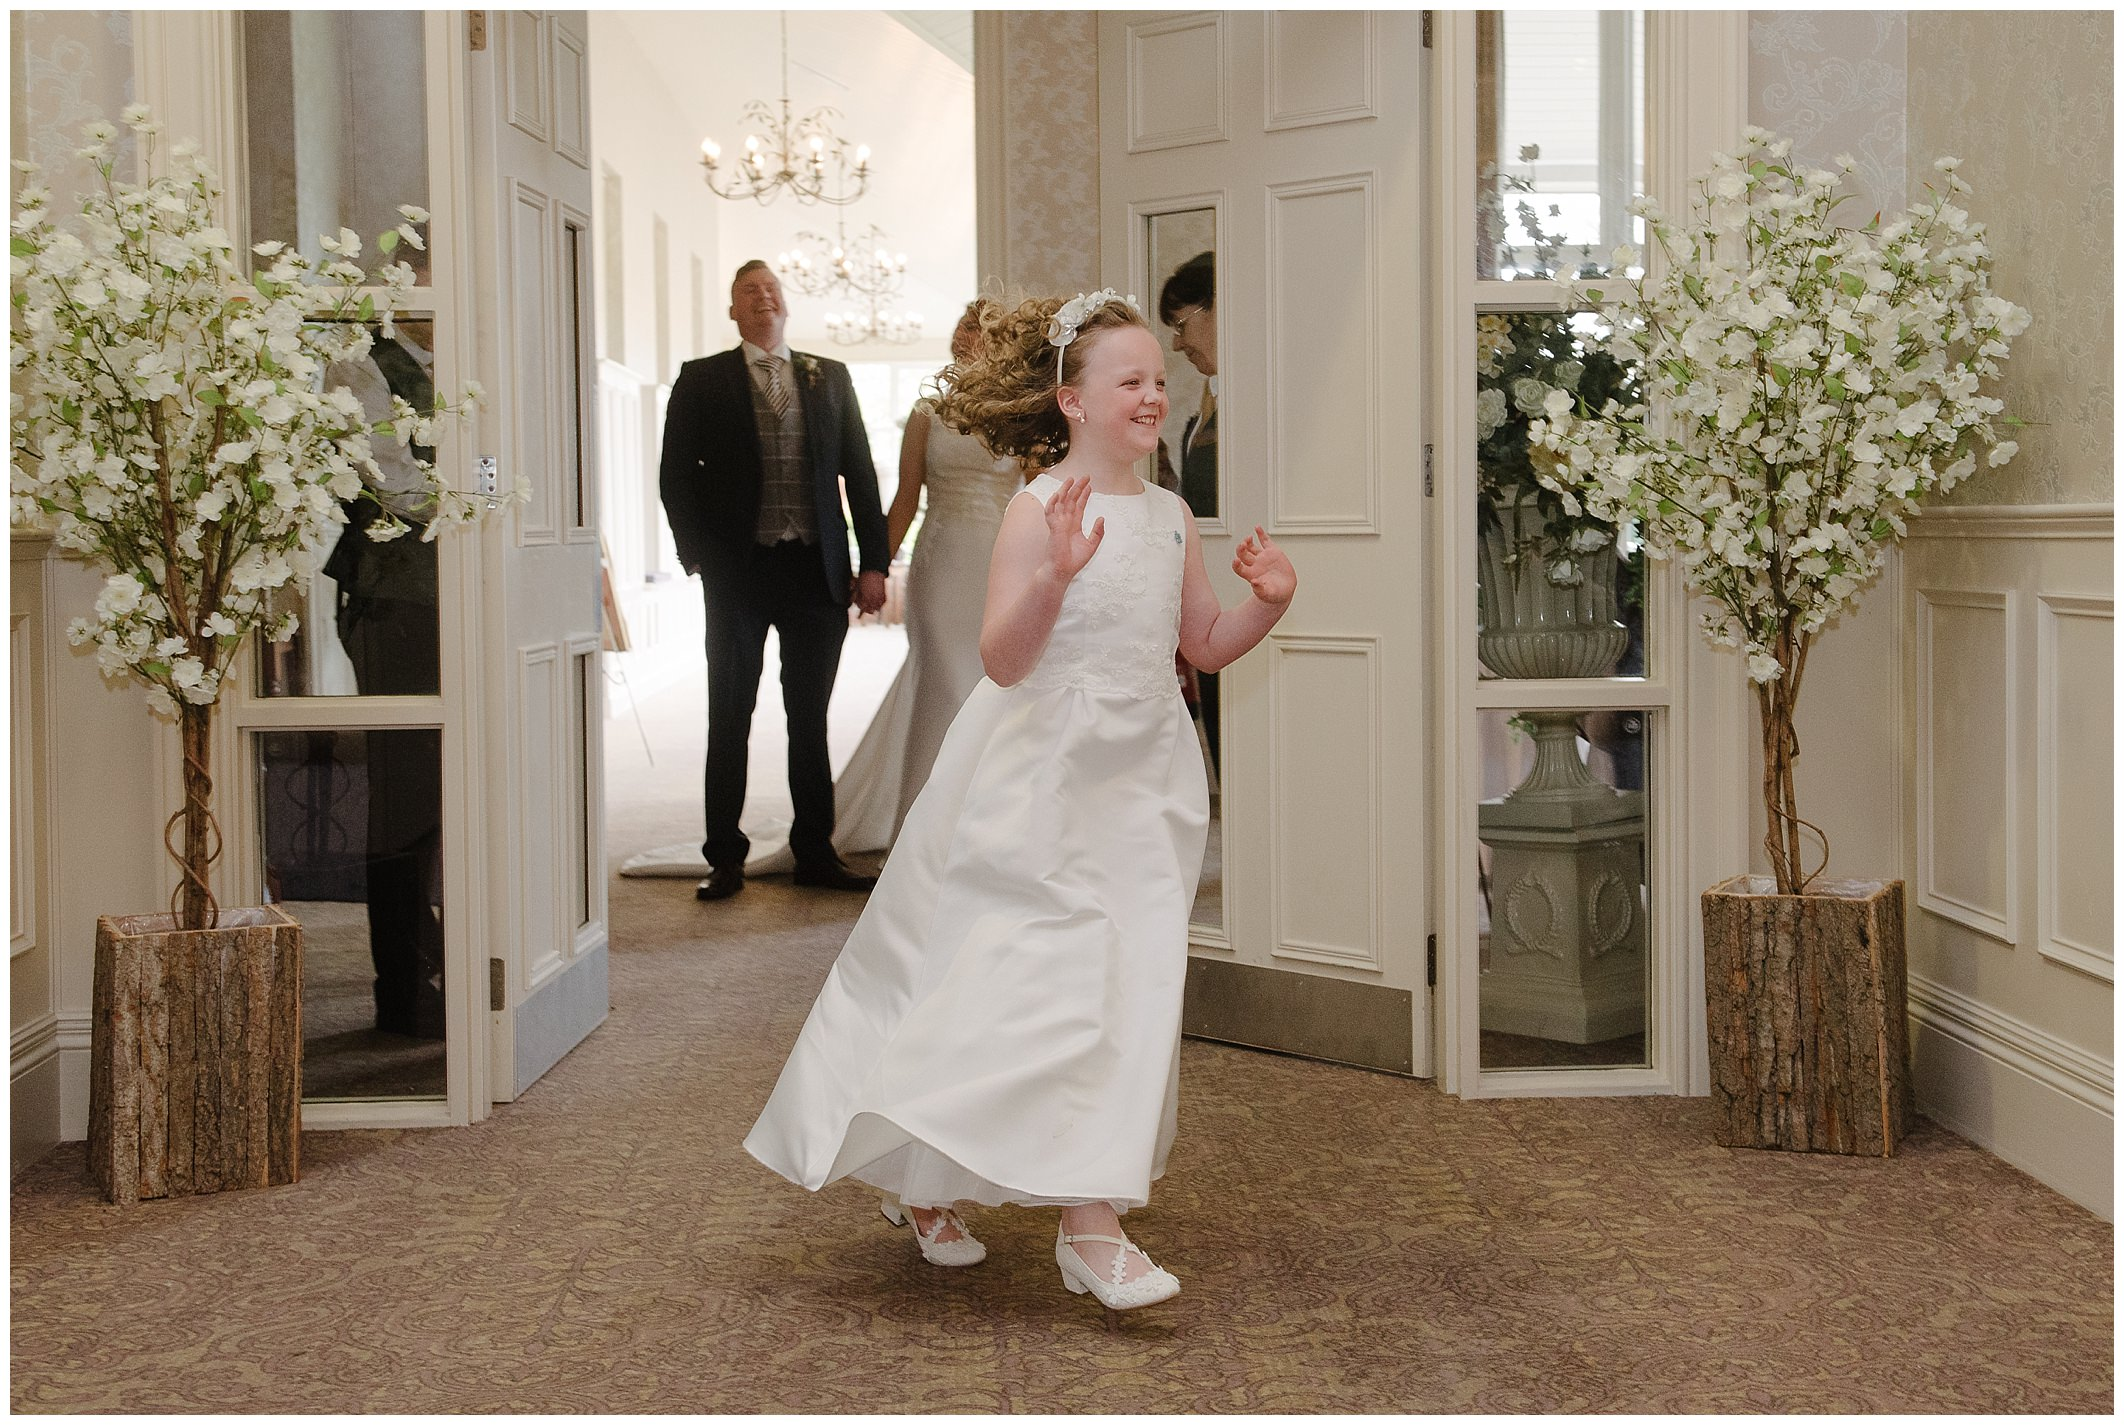 corick-house-wedding-hannah-gary-jude-browne-photography_0074.jpg